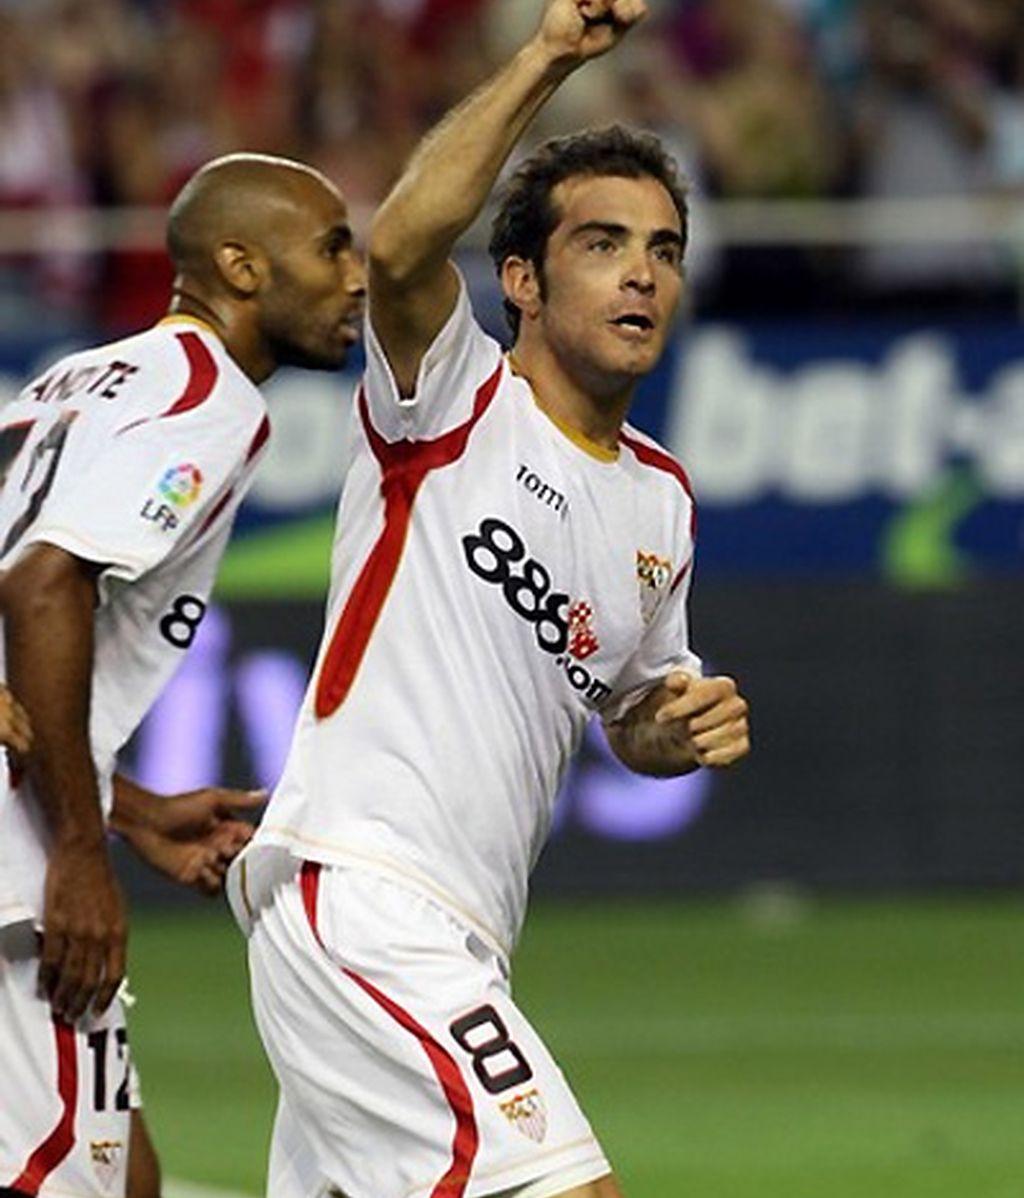 Maresca celebra un gol durante su etapa como sevillista. FOTO: Archivo.